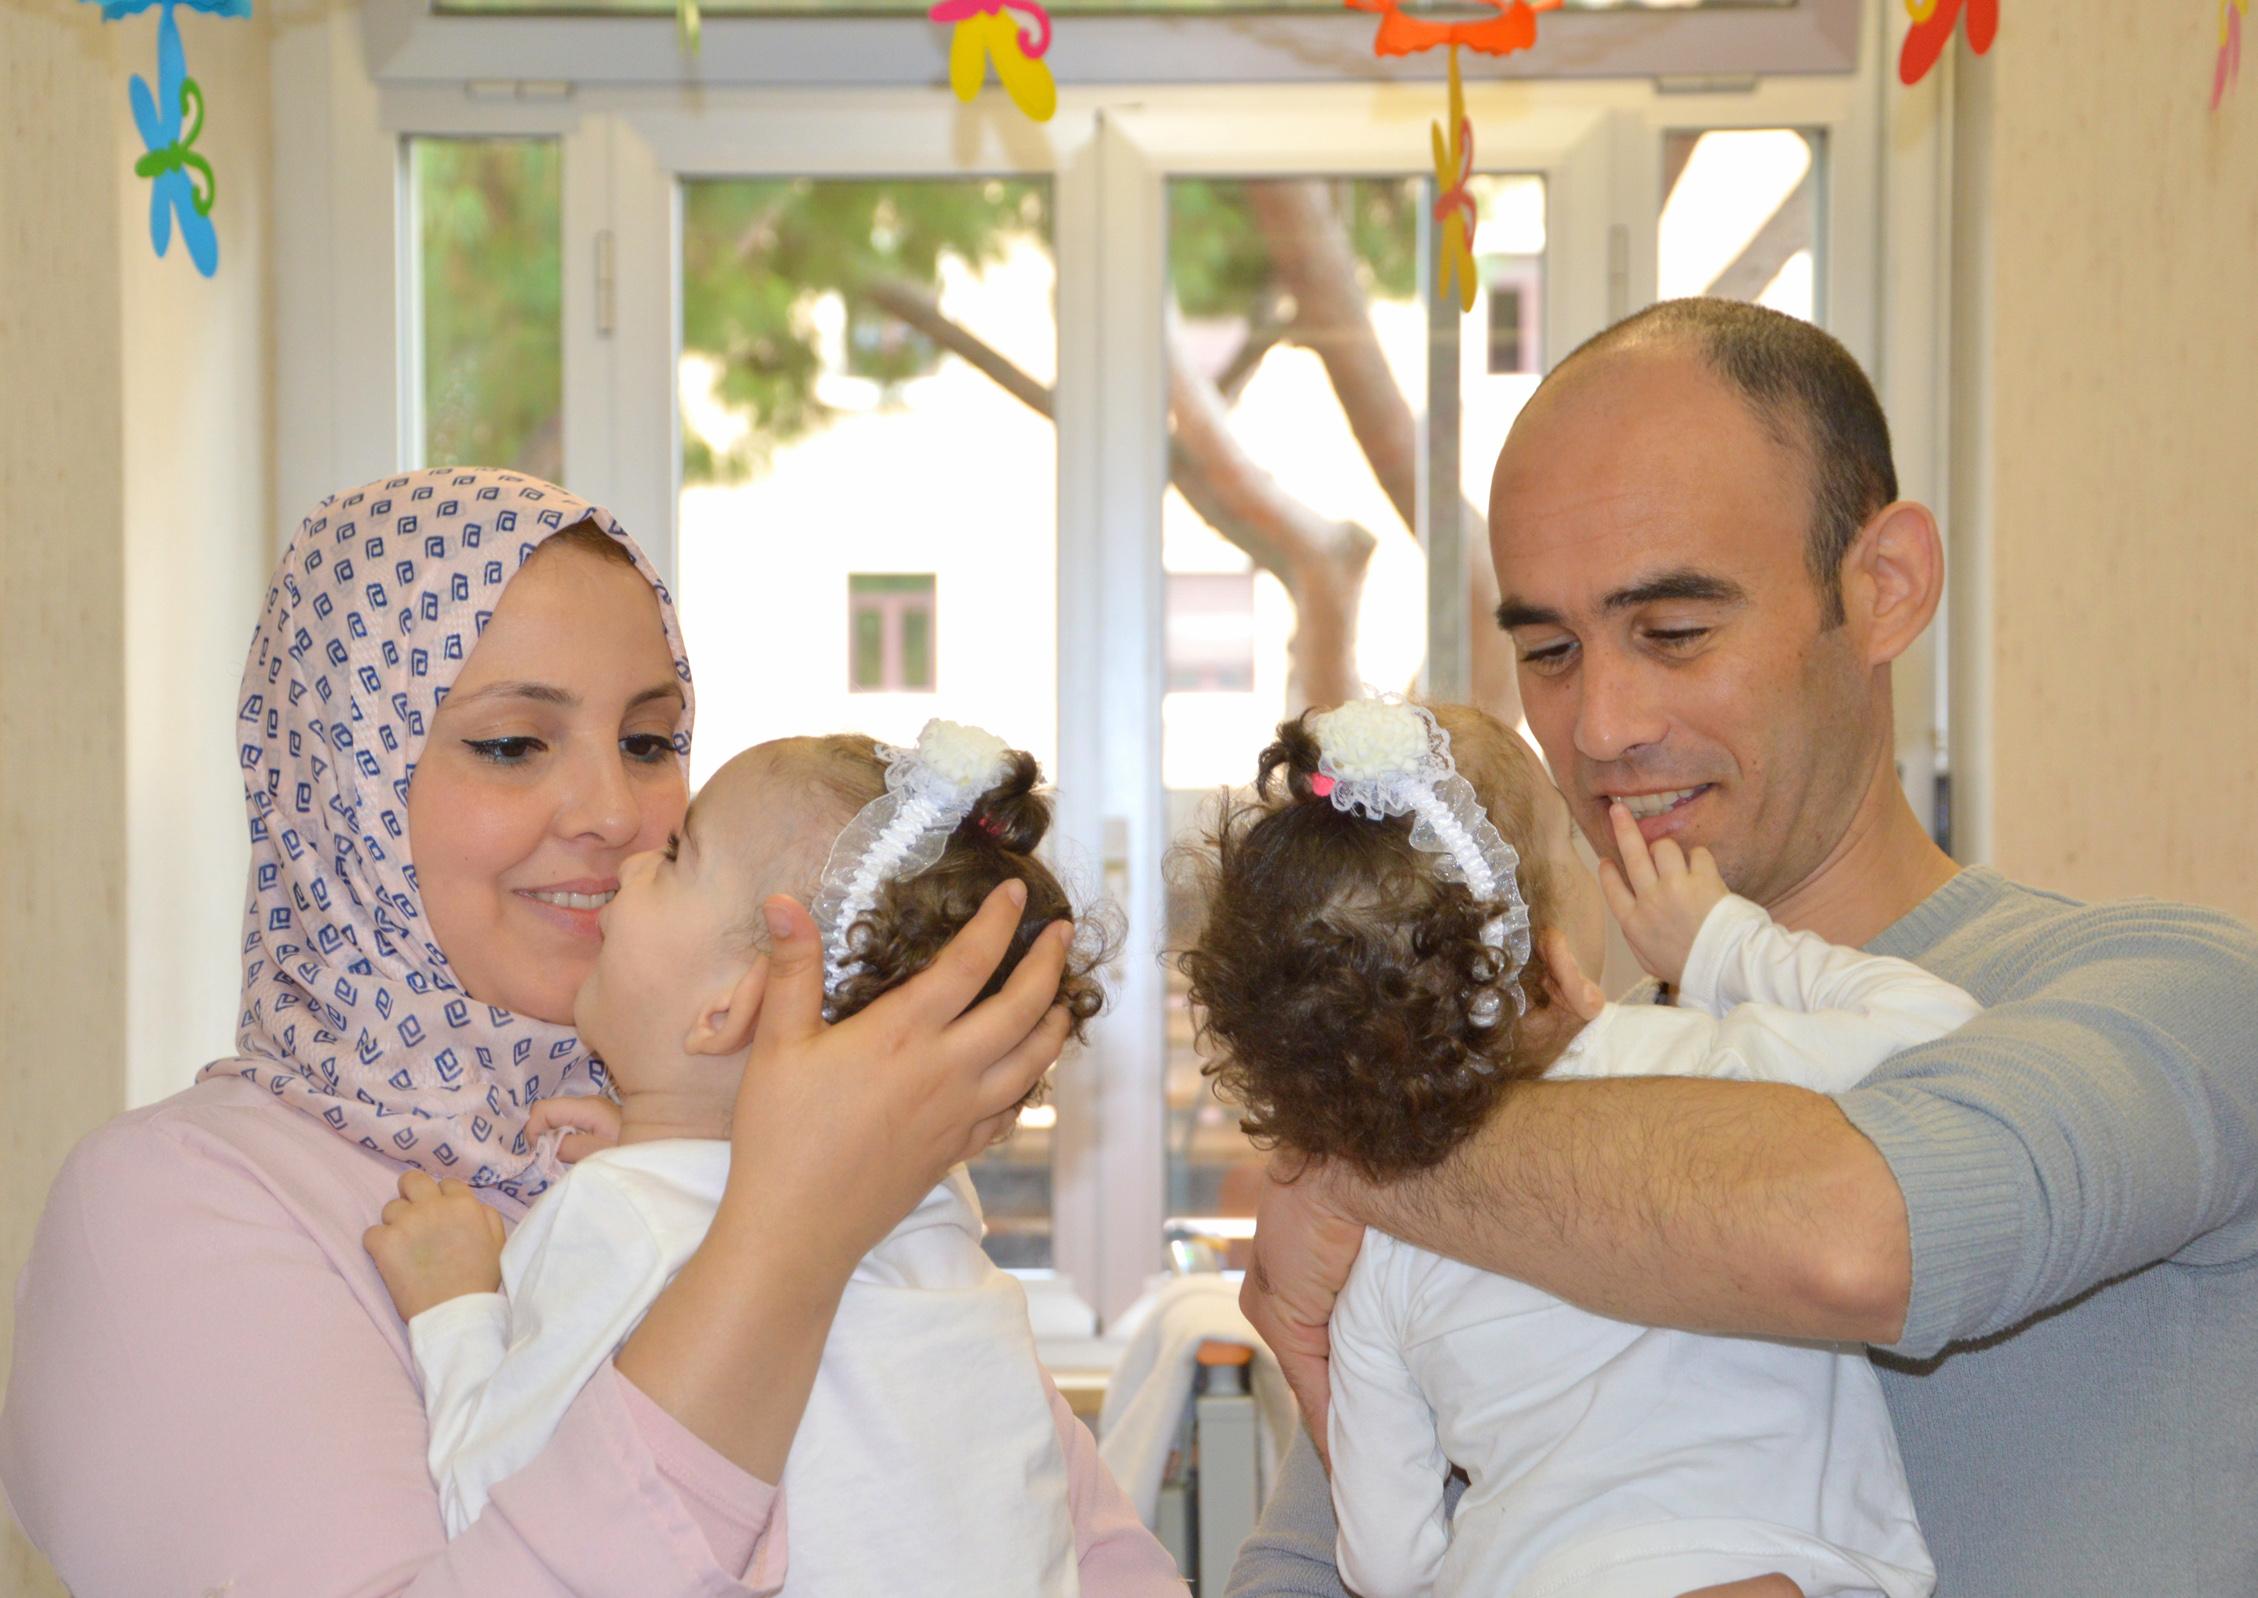 Rayenne et Djihene et leurs parents @ Bambino Gesù